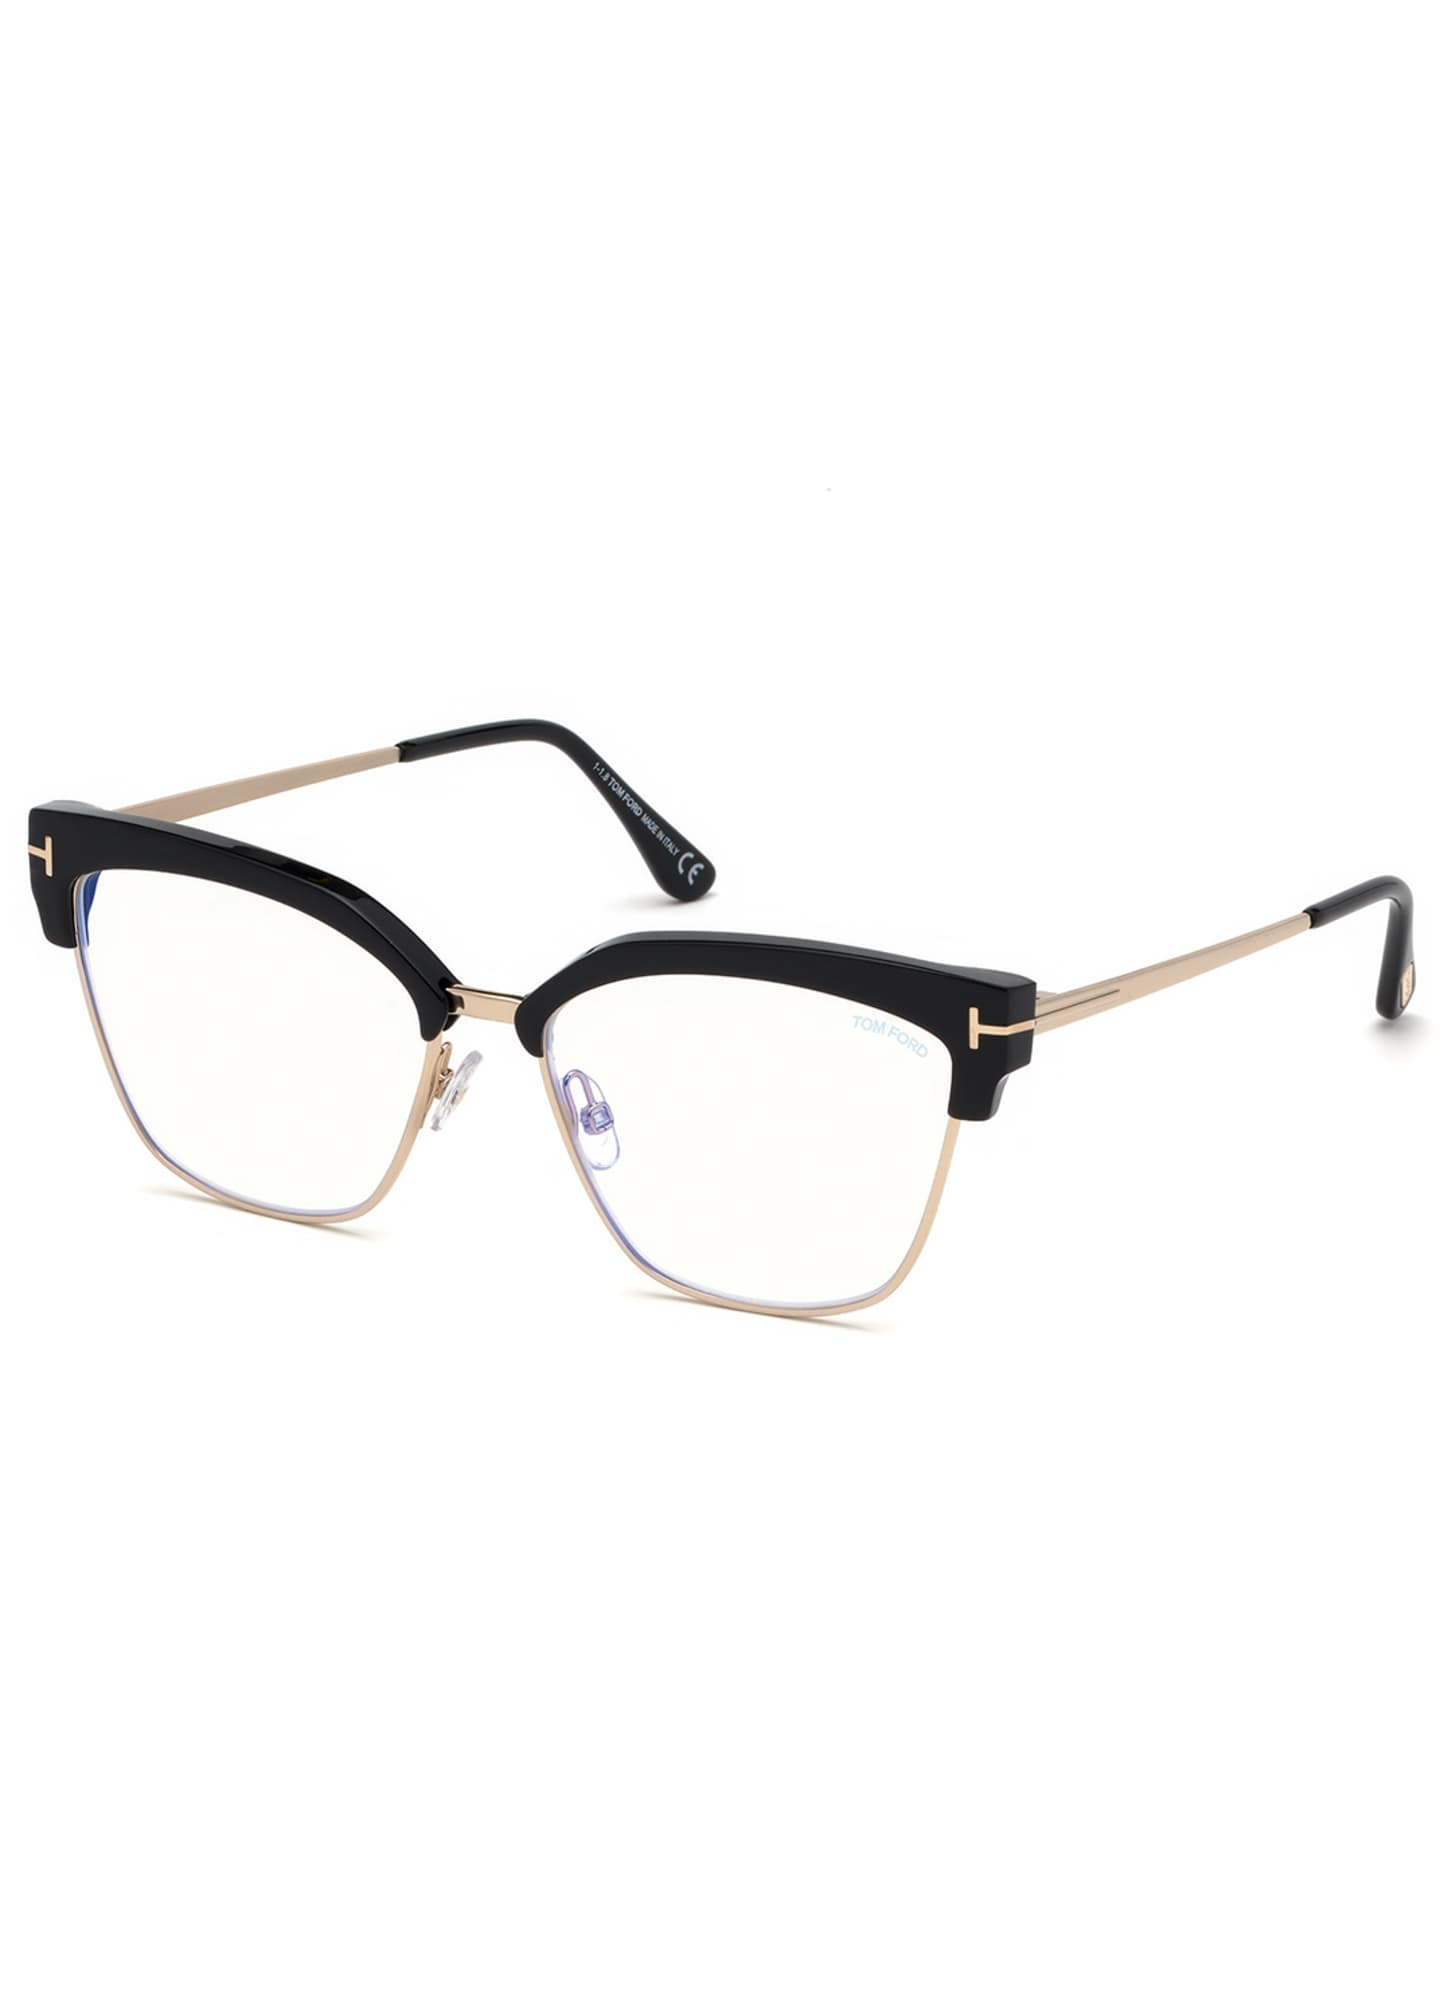 TOM FORD Cat-Eye Acetate & Metal Optical Frames